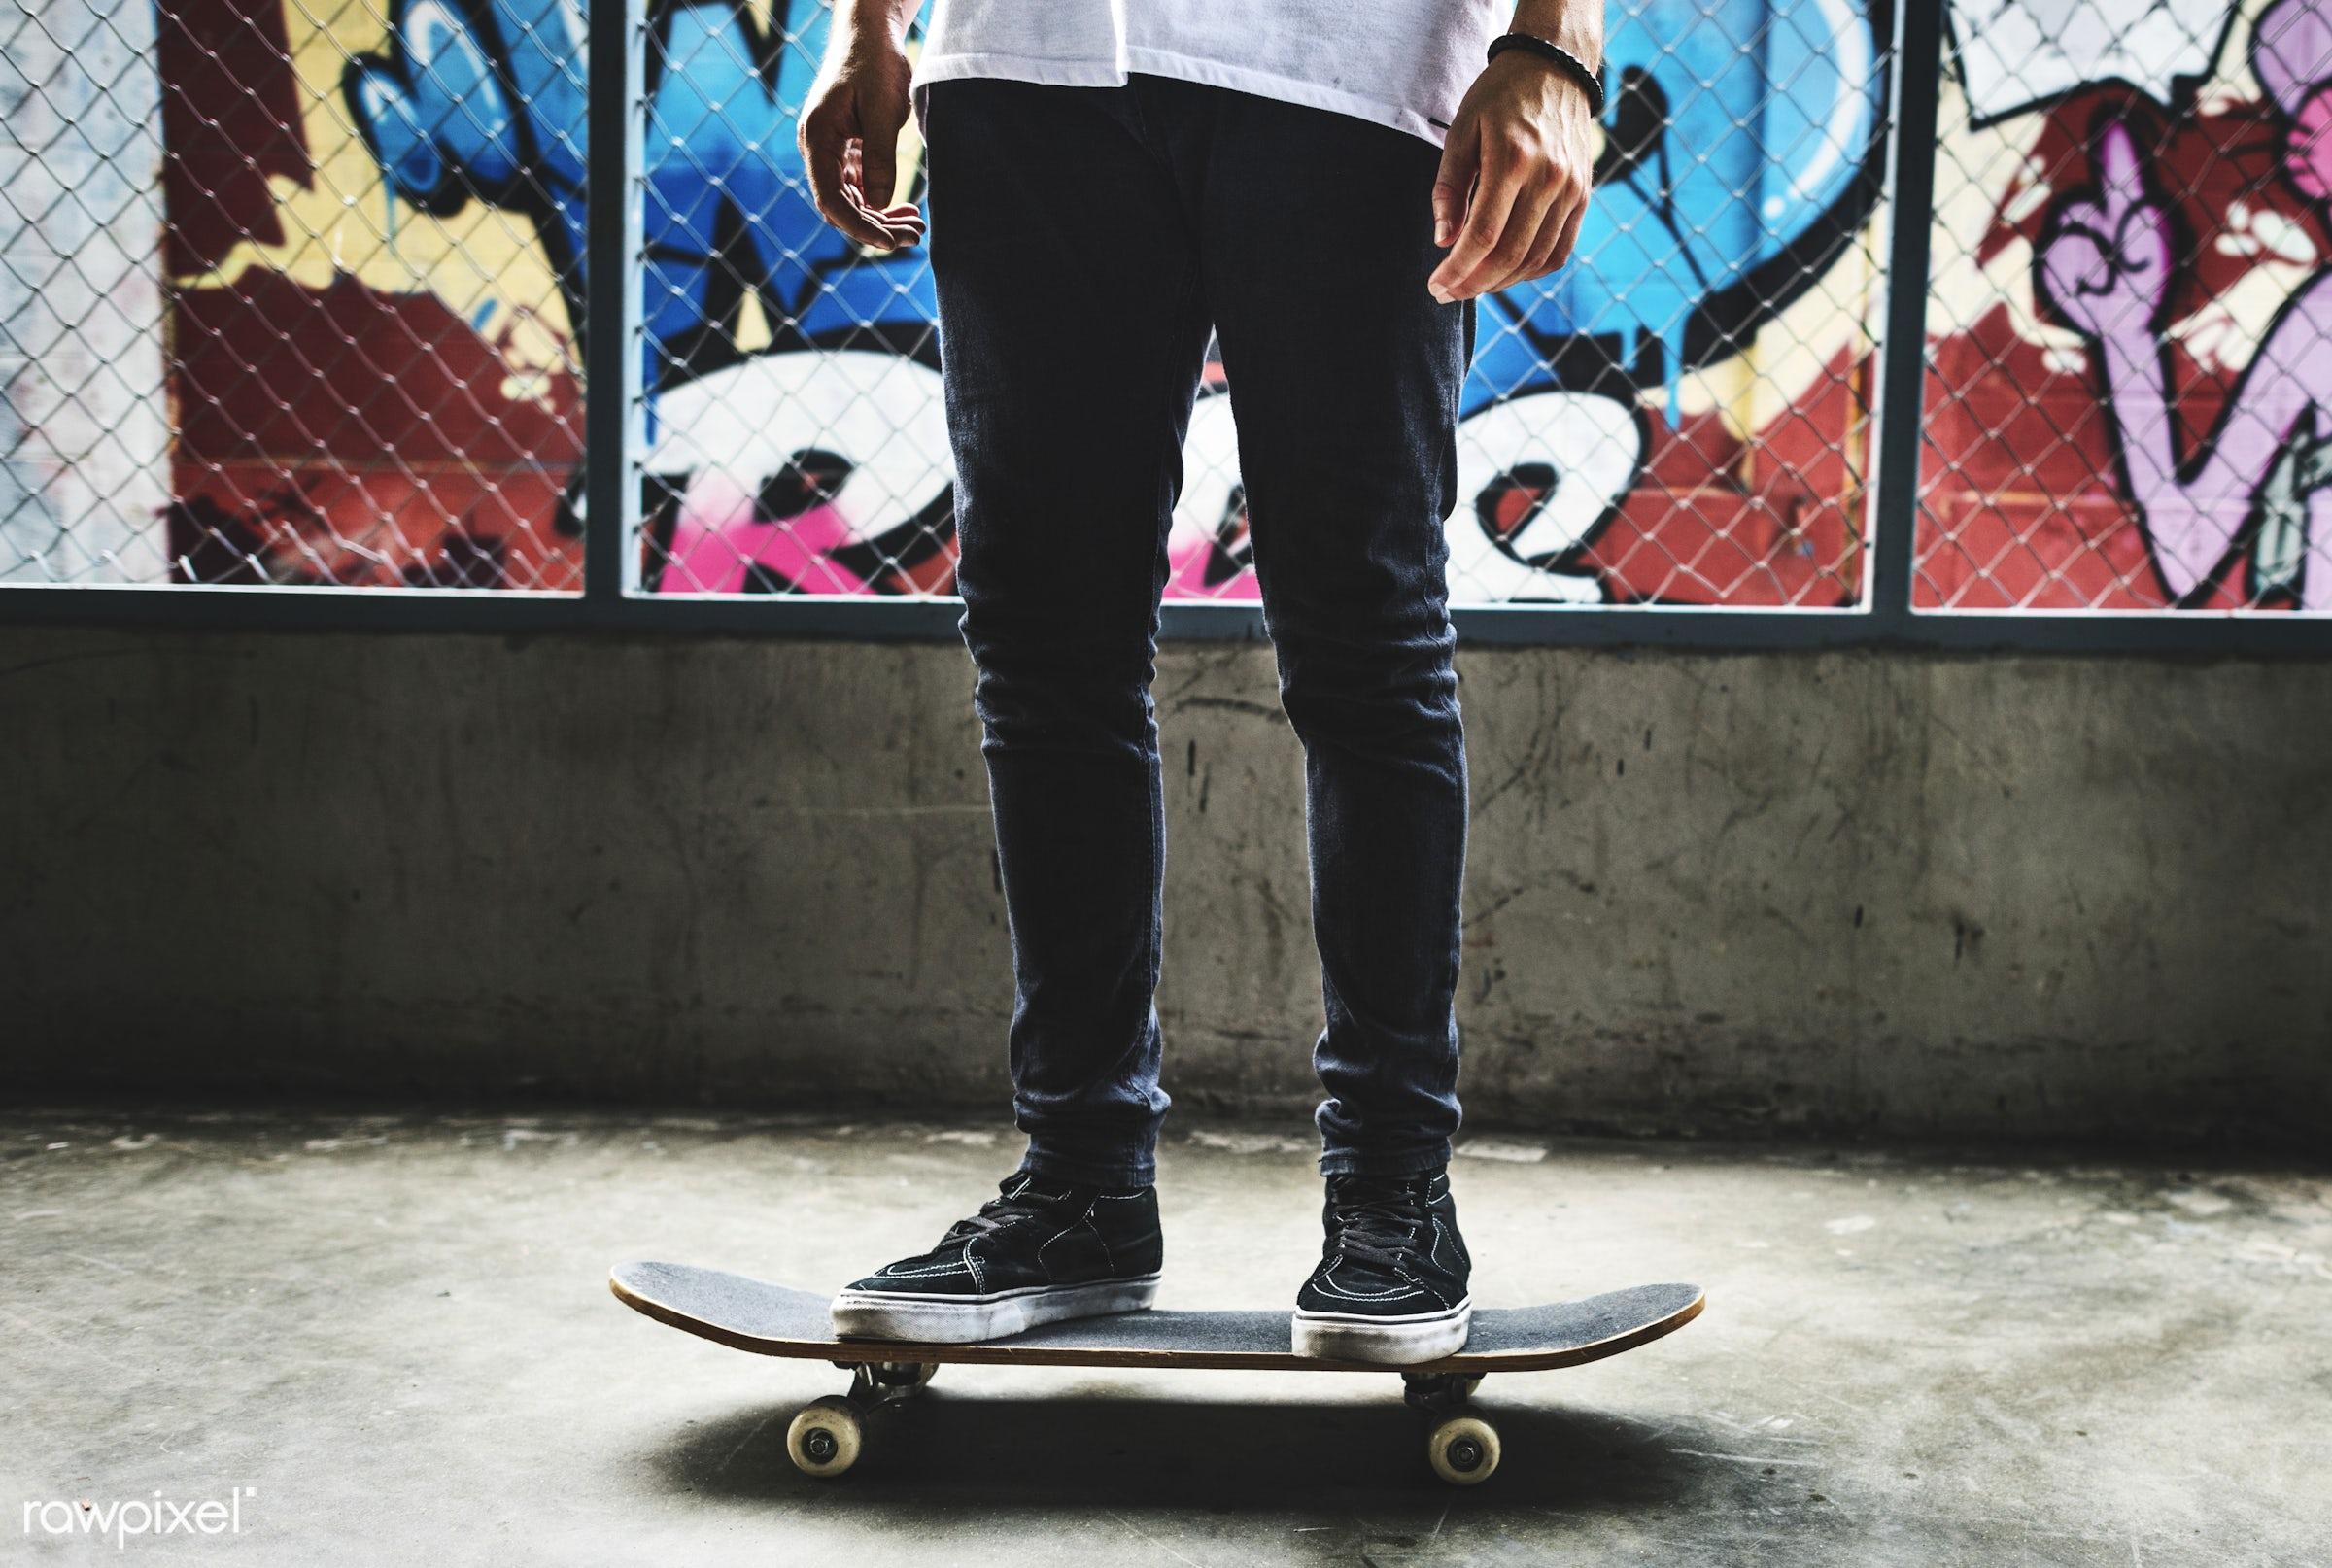 extreme sport, hobby, leisure, recreation, skateboard, skateboarder, legs, alone, standing, activity